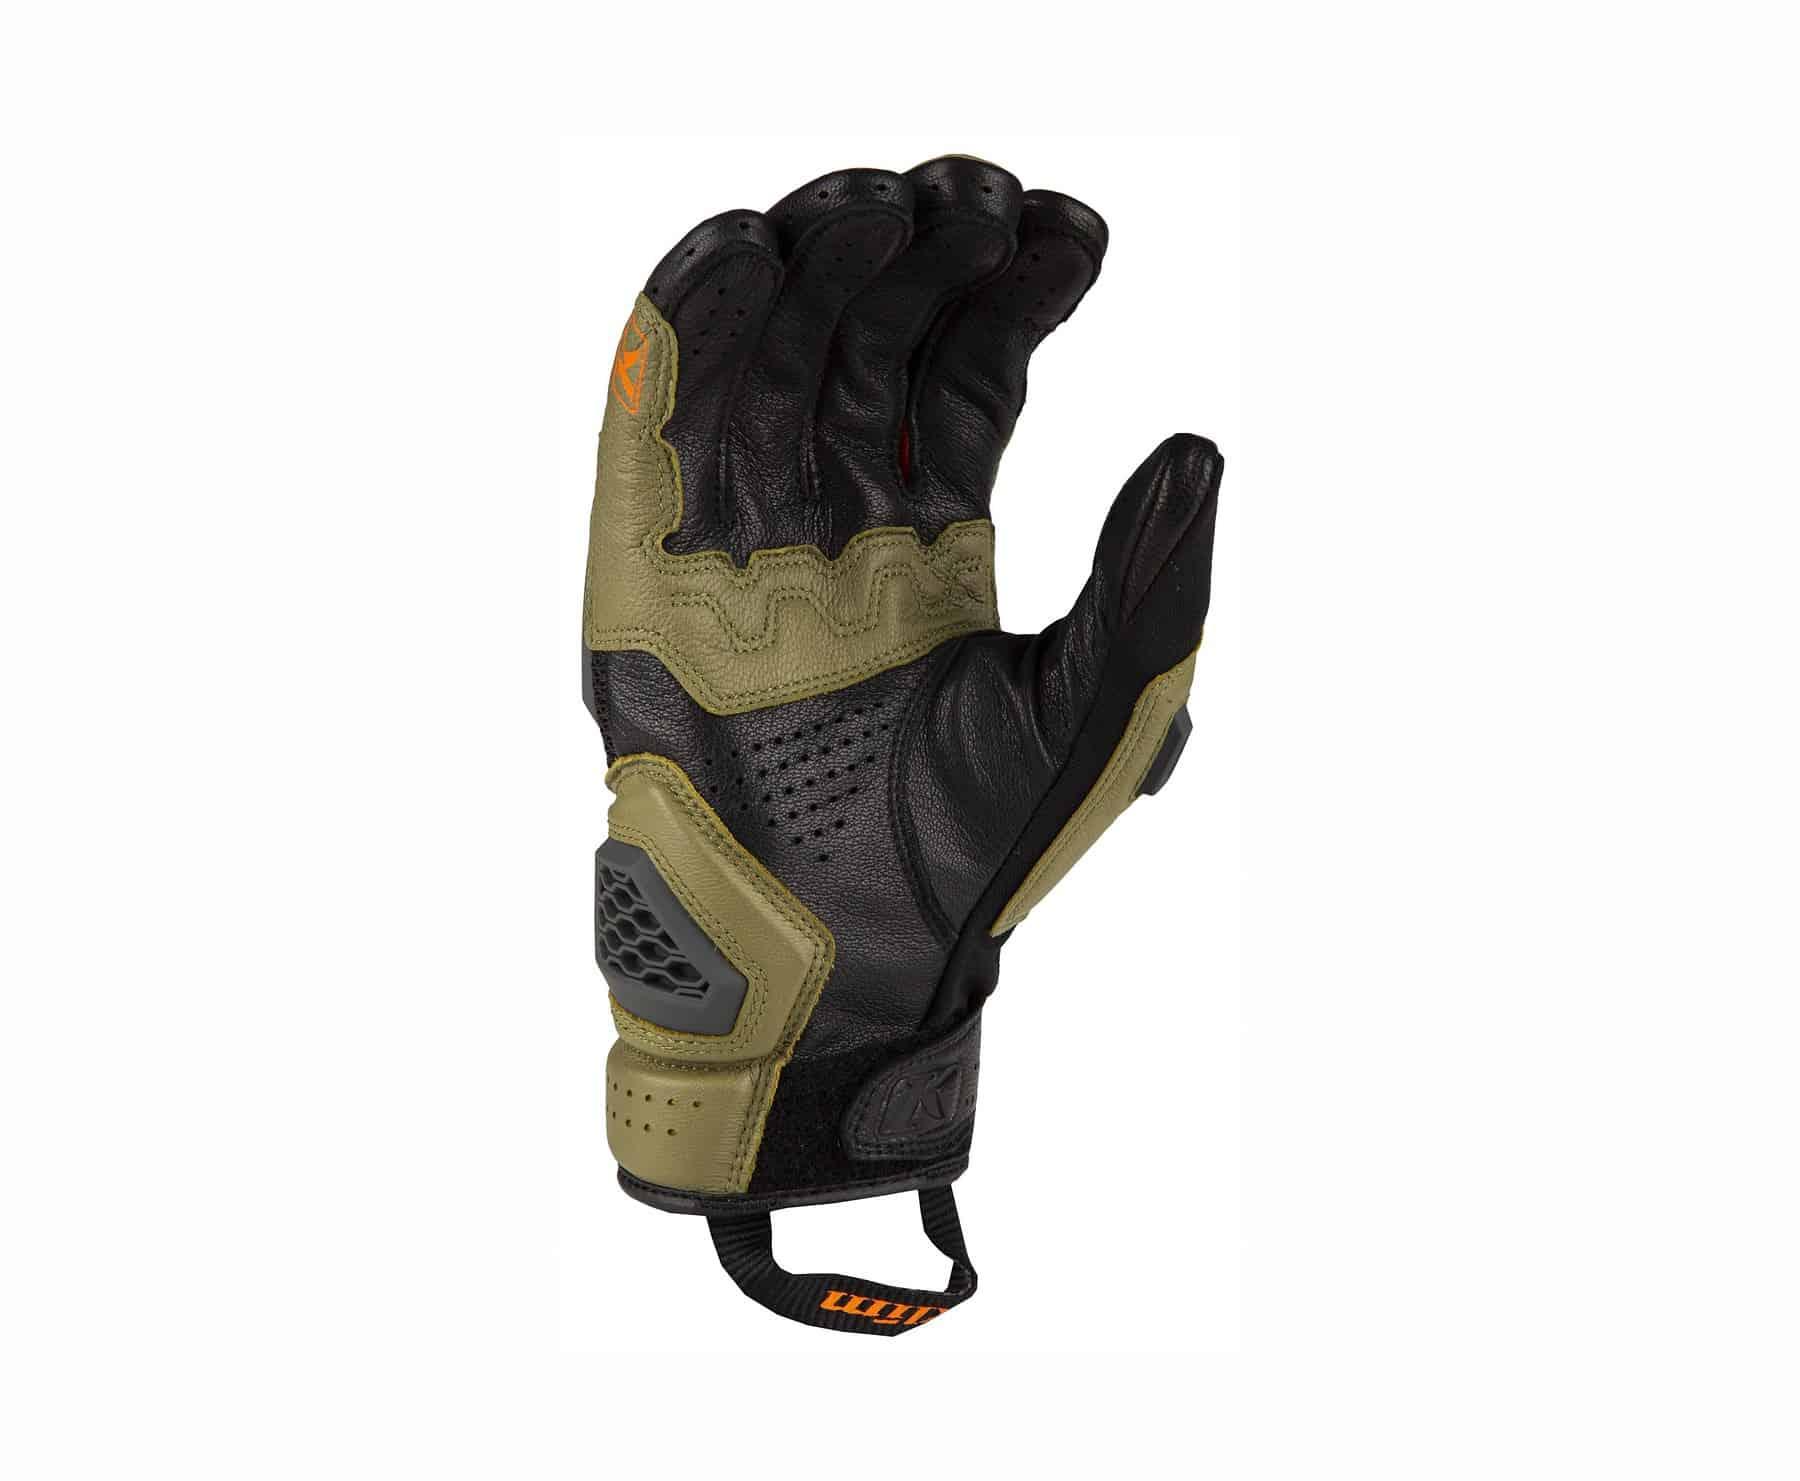 KLIM-New-Baja-S4-gloves 3b